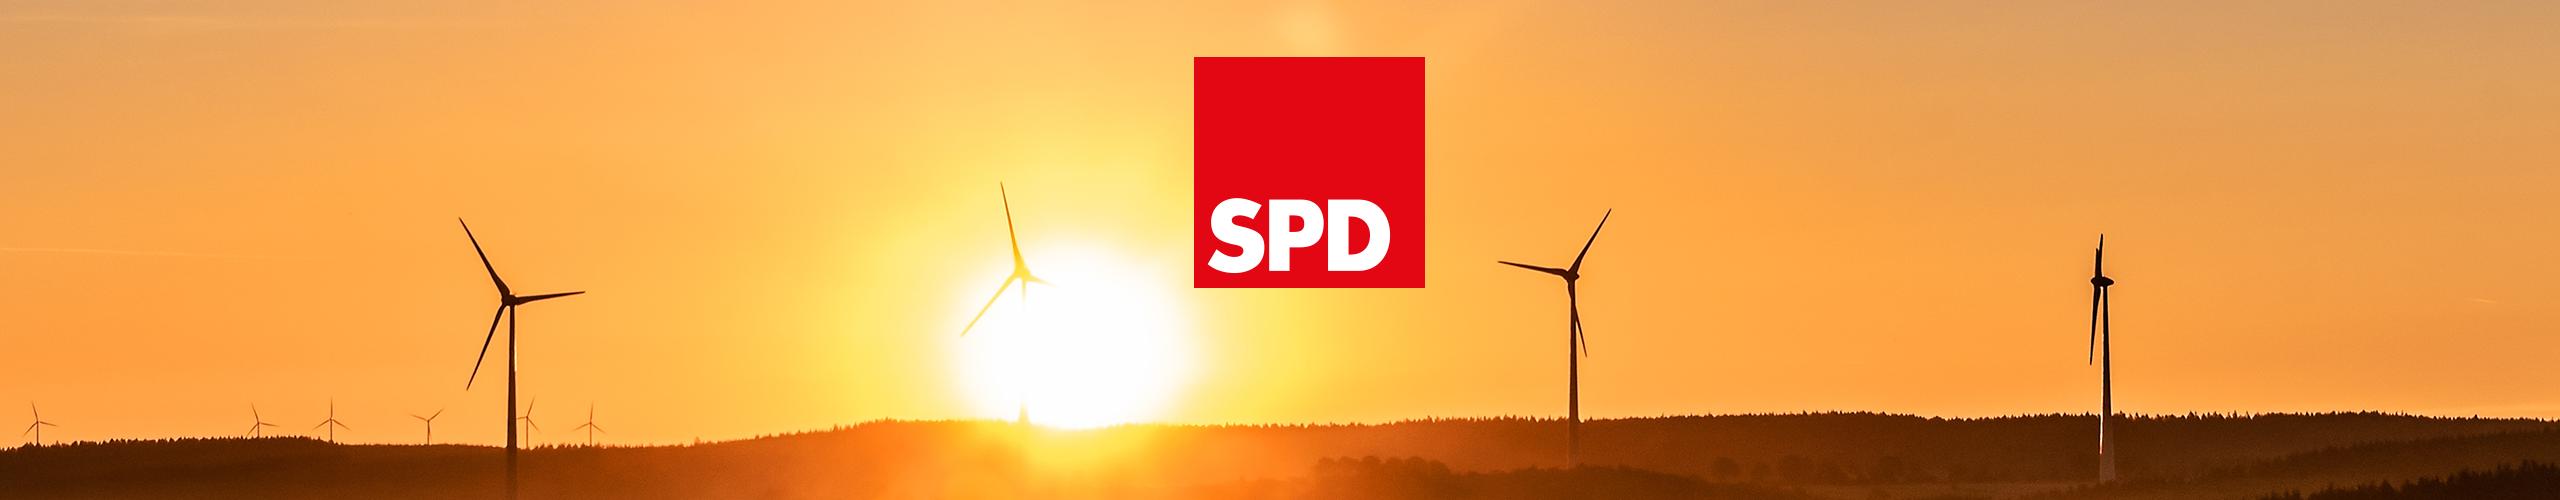 Sozialdemokratischer Energiewende-Appell